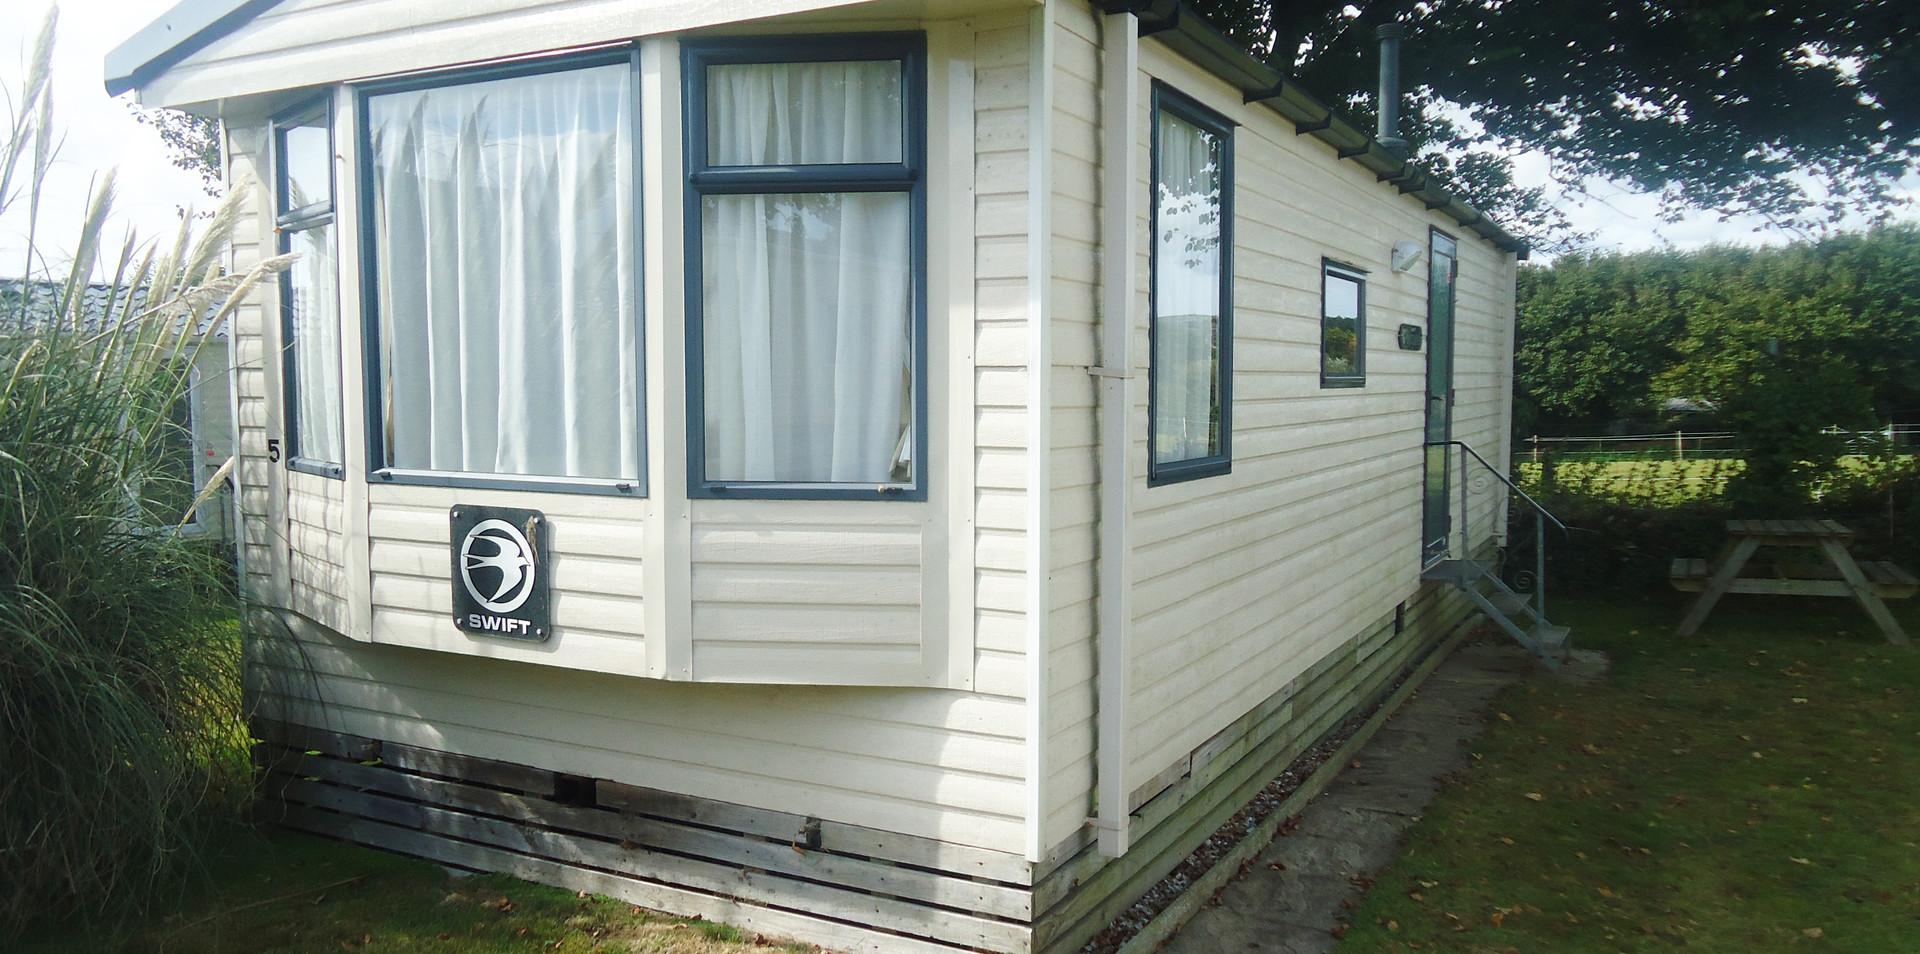 Mount's Bay Caravan Park - Burgundy2